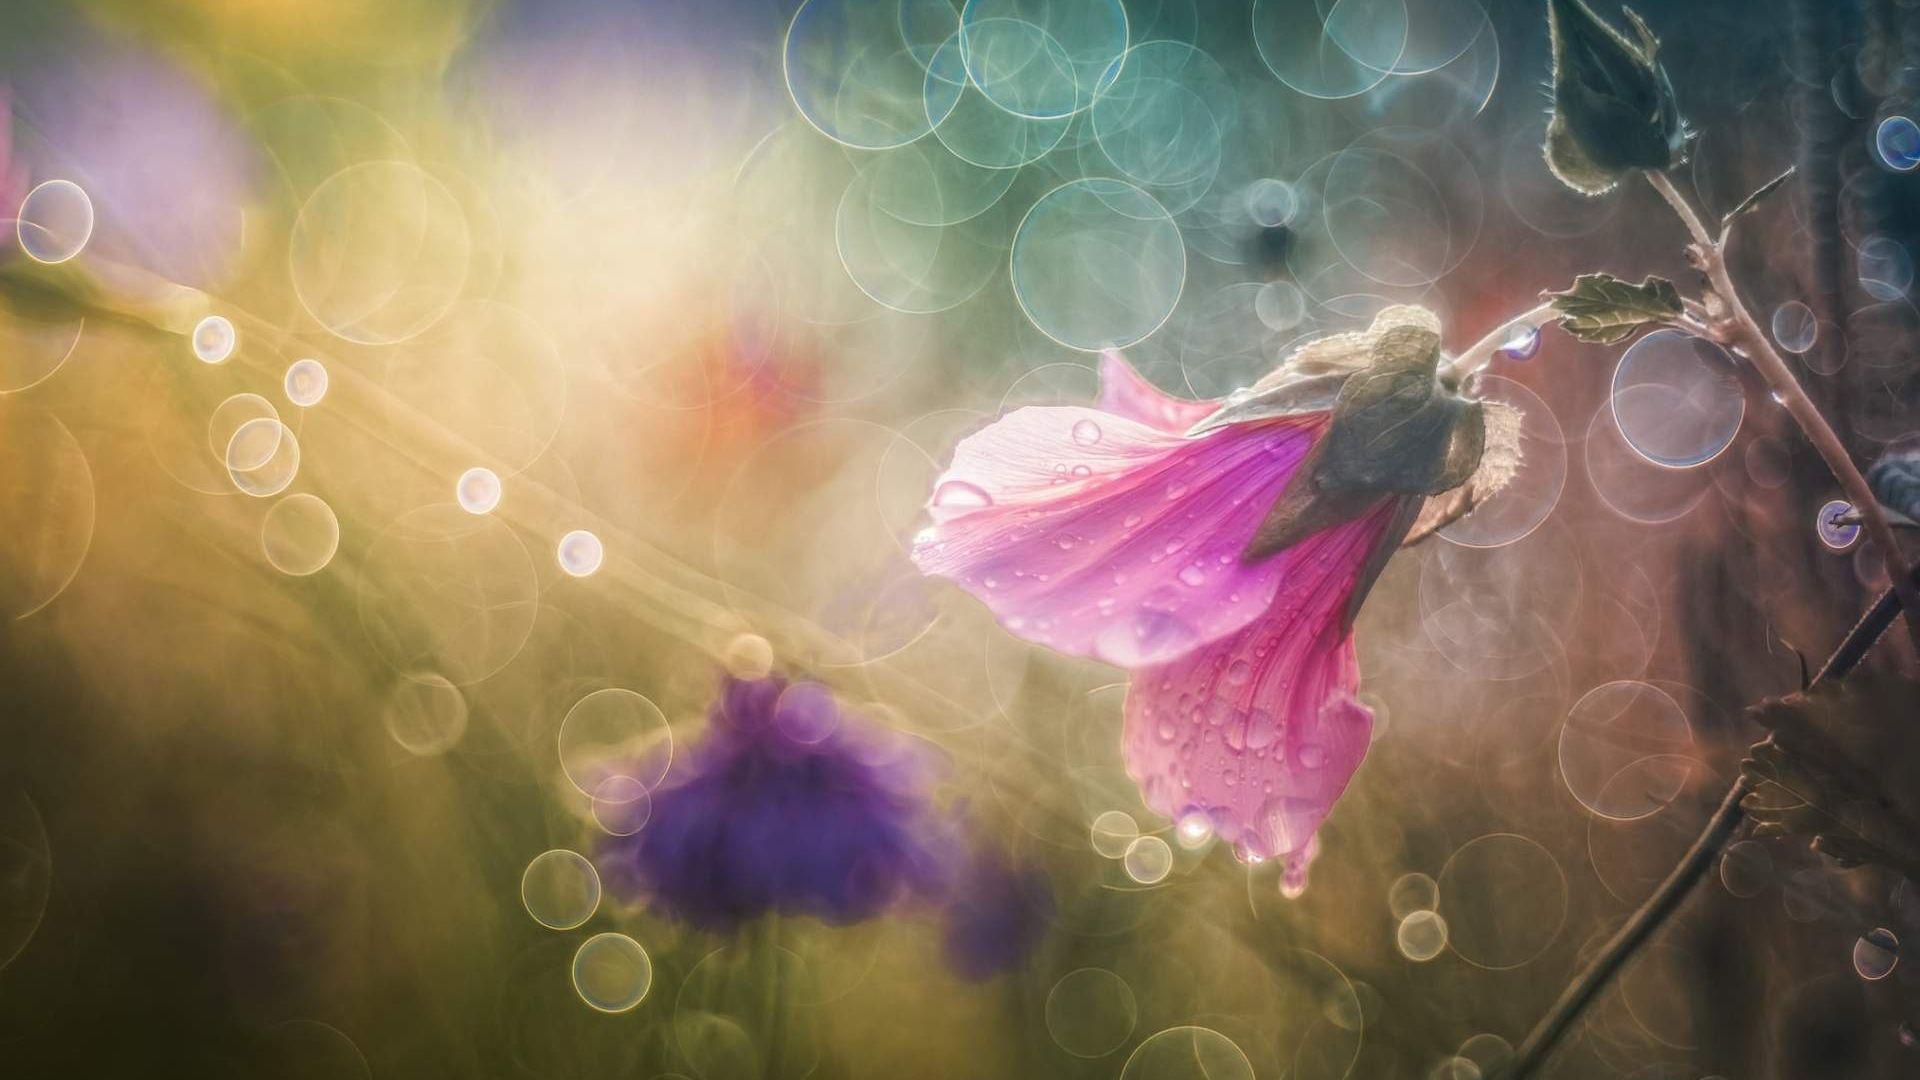 Desktop Wallpaper Pink Flower Glitter Background Hd Image Picture